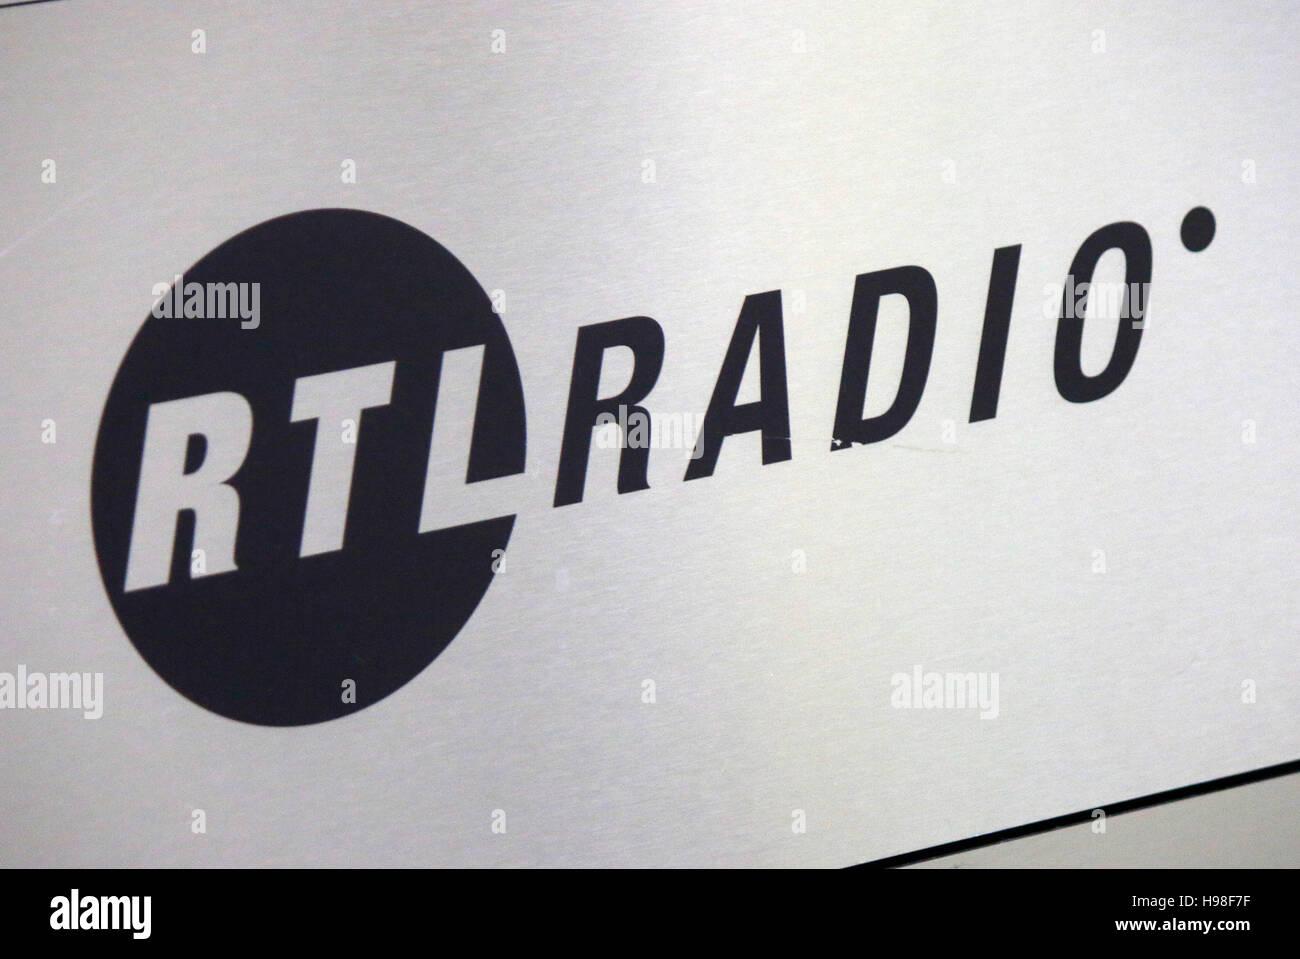 das Logo der Marke 'RTL Radio', Berlin. - Stock Image